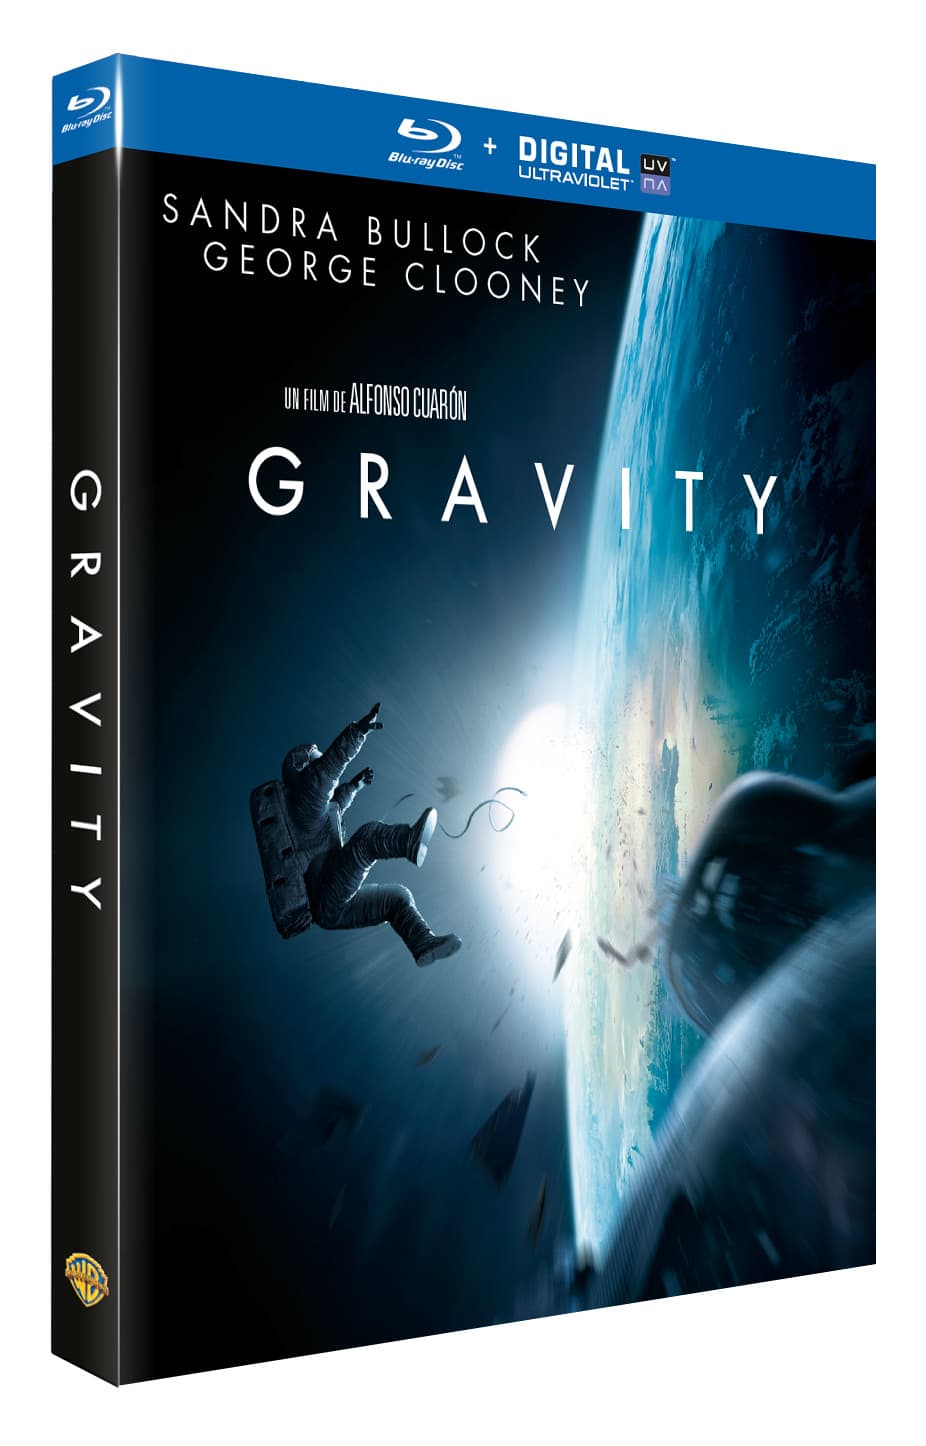 Miss Bobby_Blu-Ray_Gravity